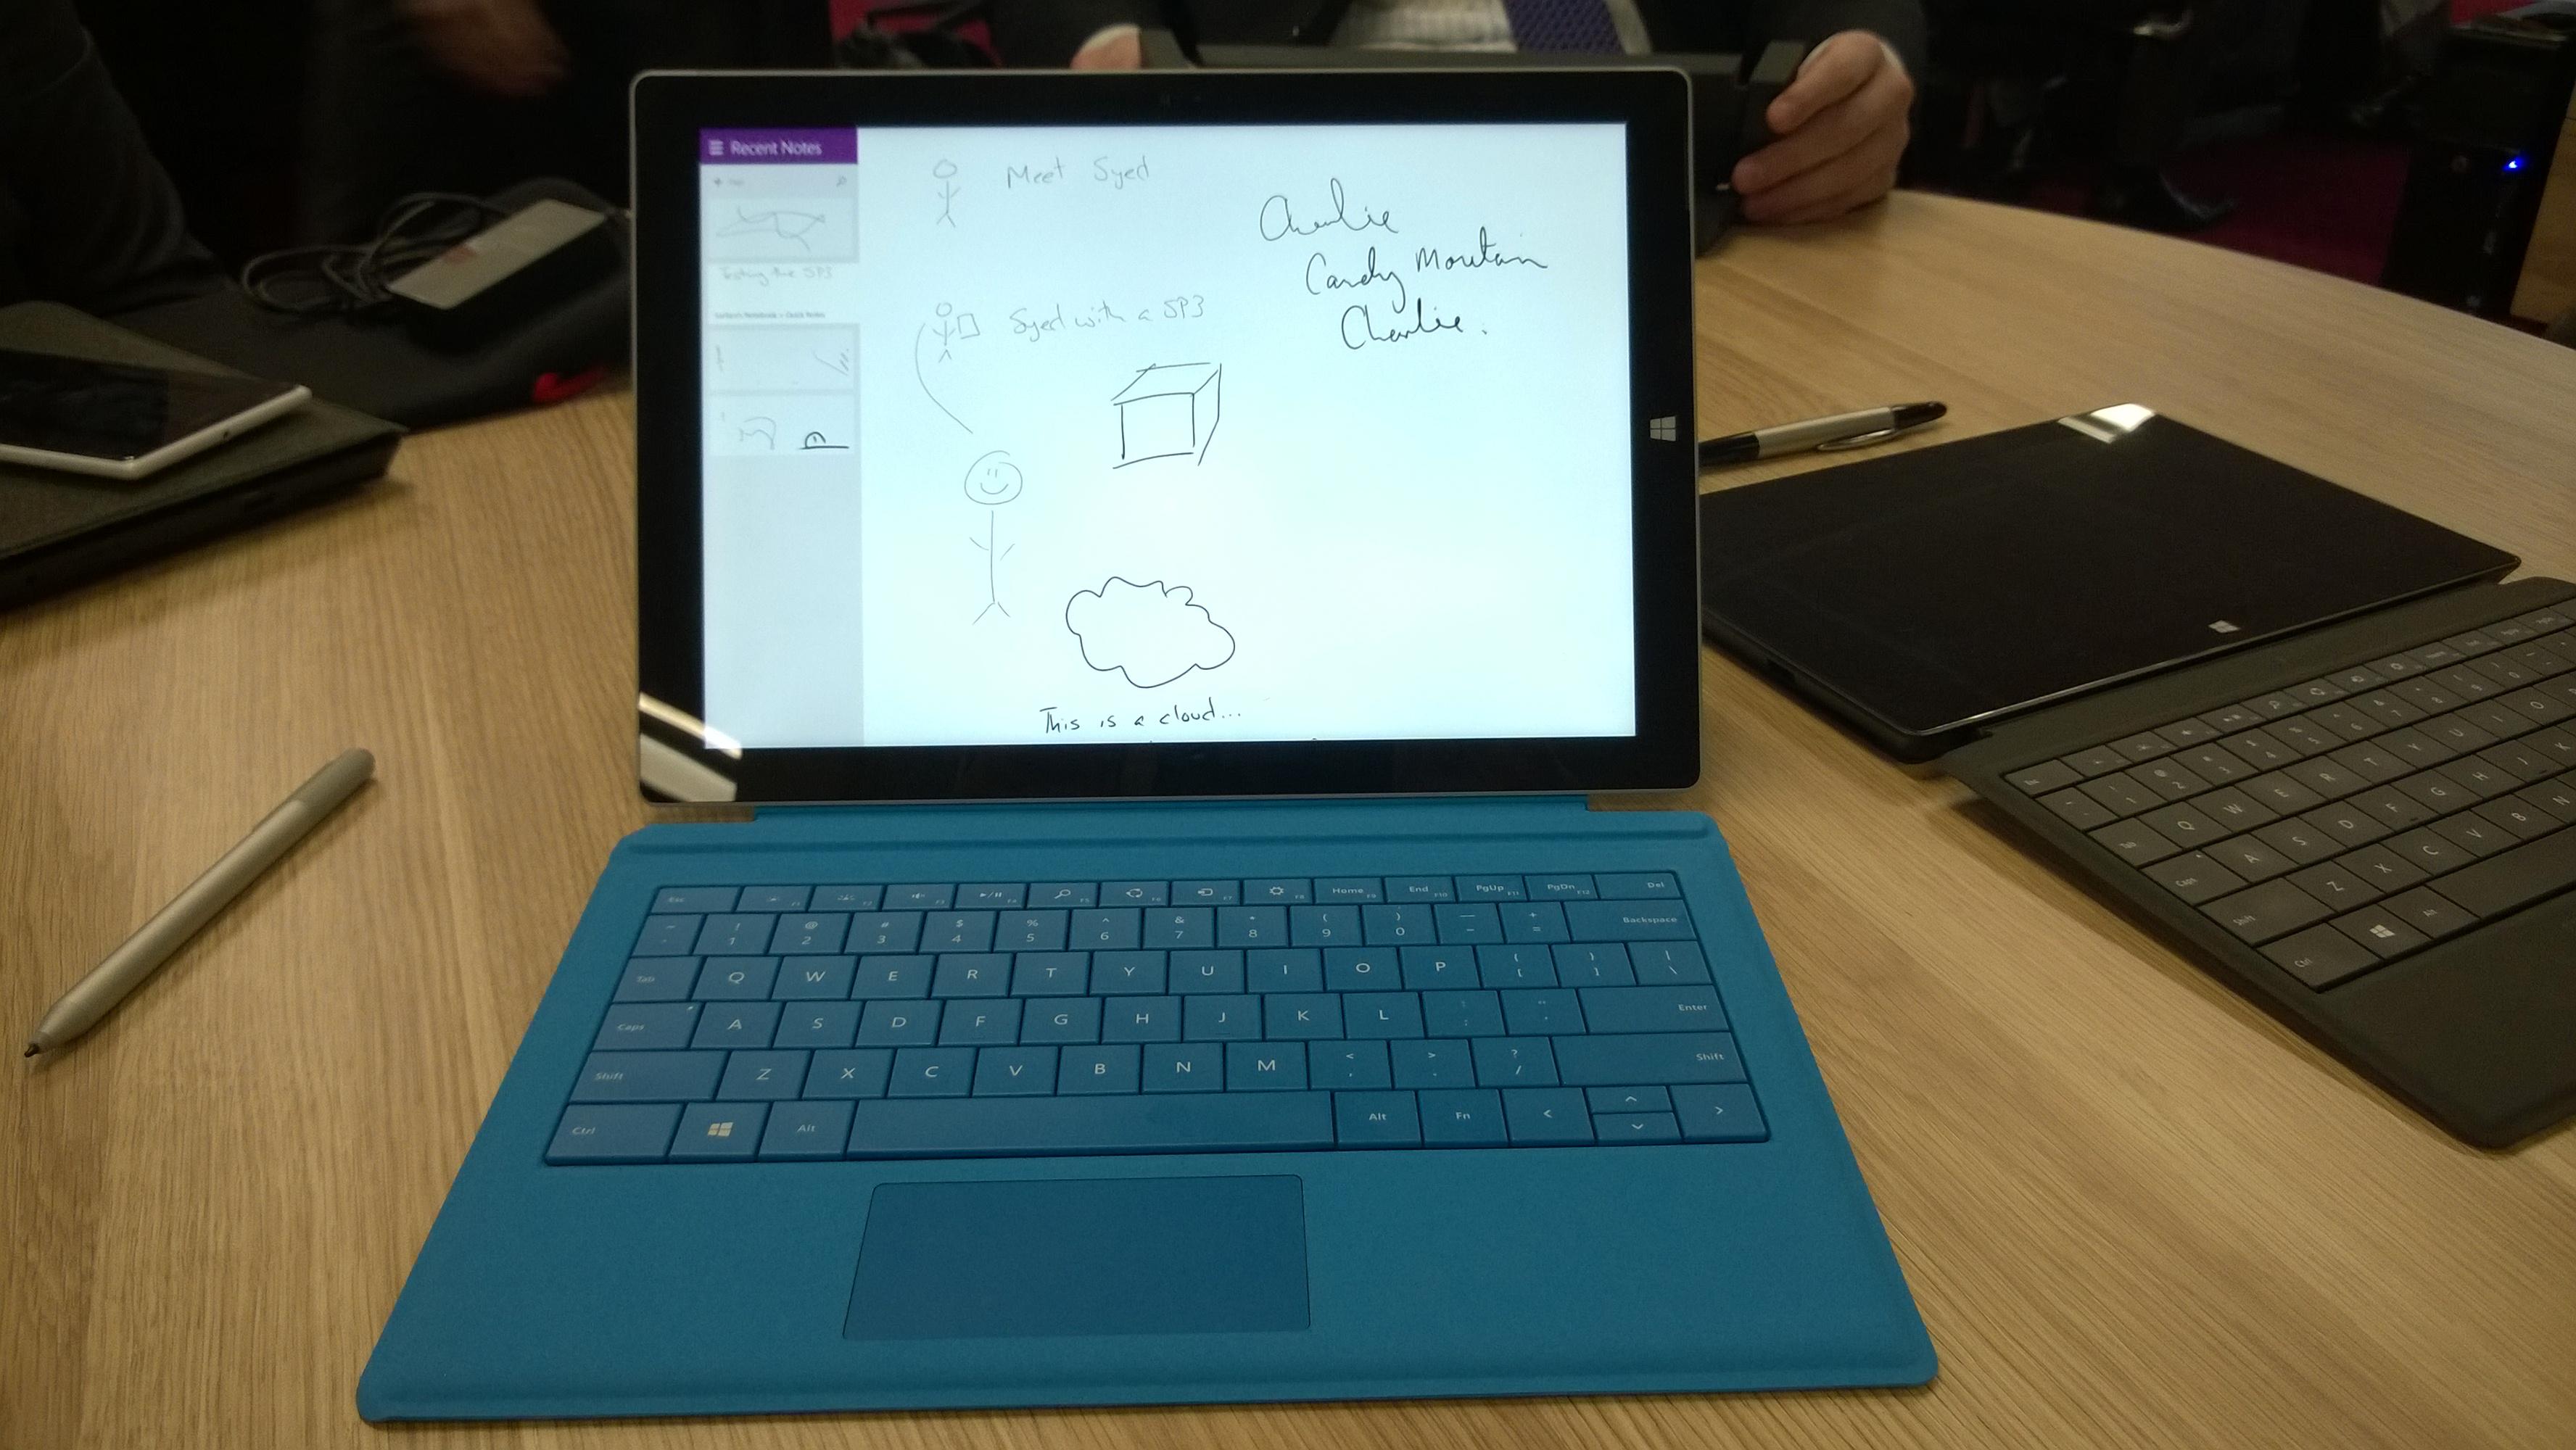 Surface Pro 3 inking